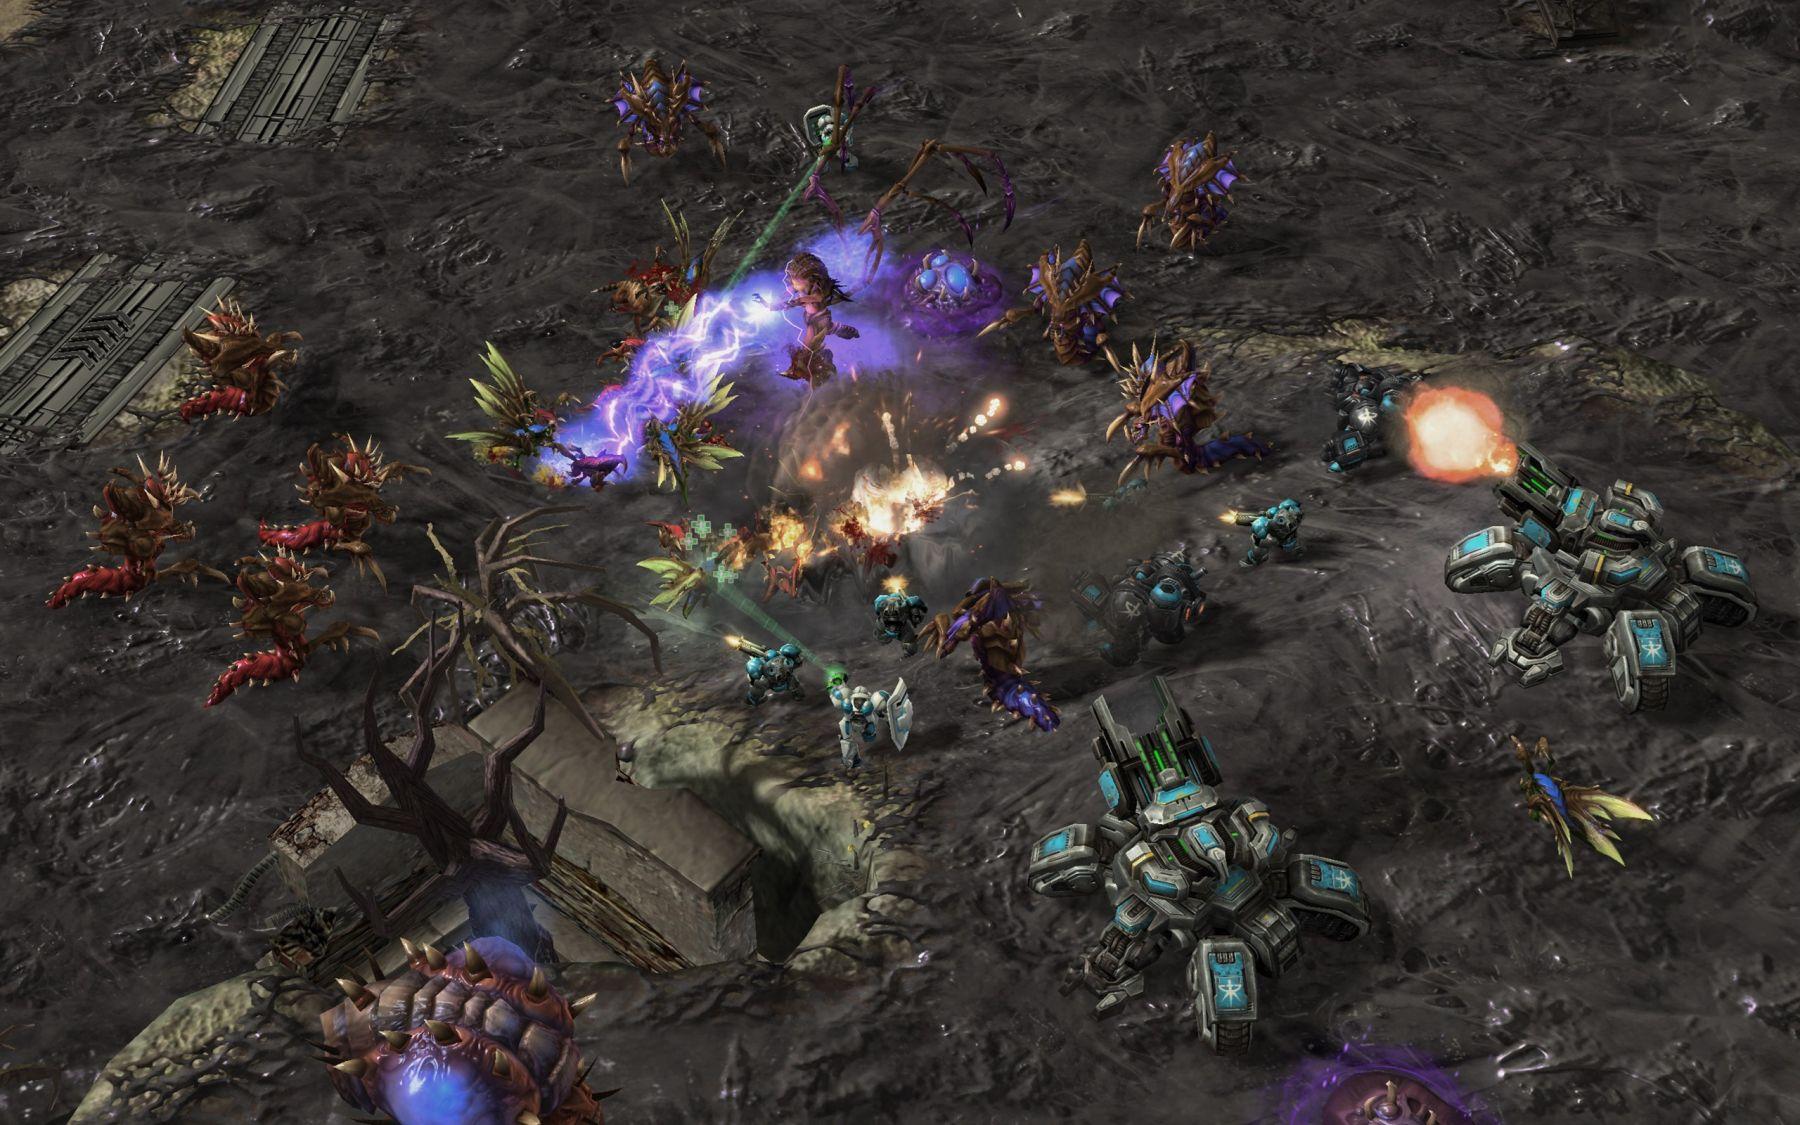 sc2_gamescom_allied_commanders_co-op_04_png_jpgcopy